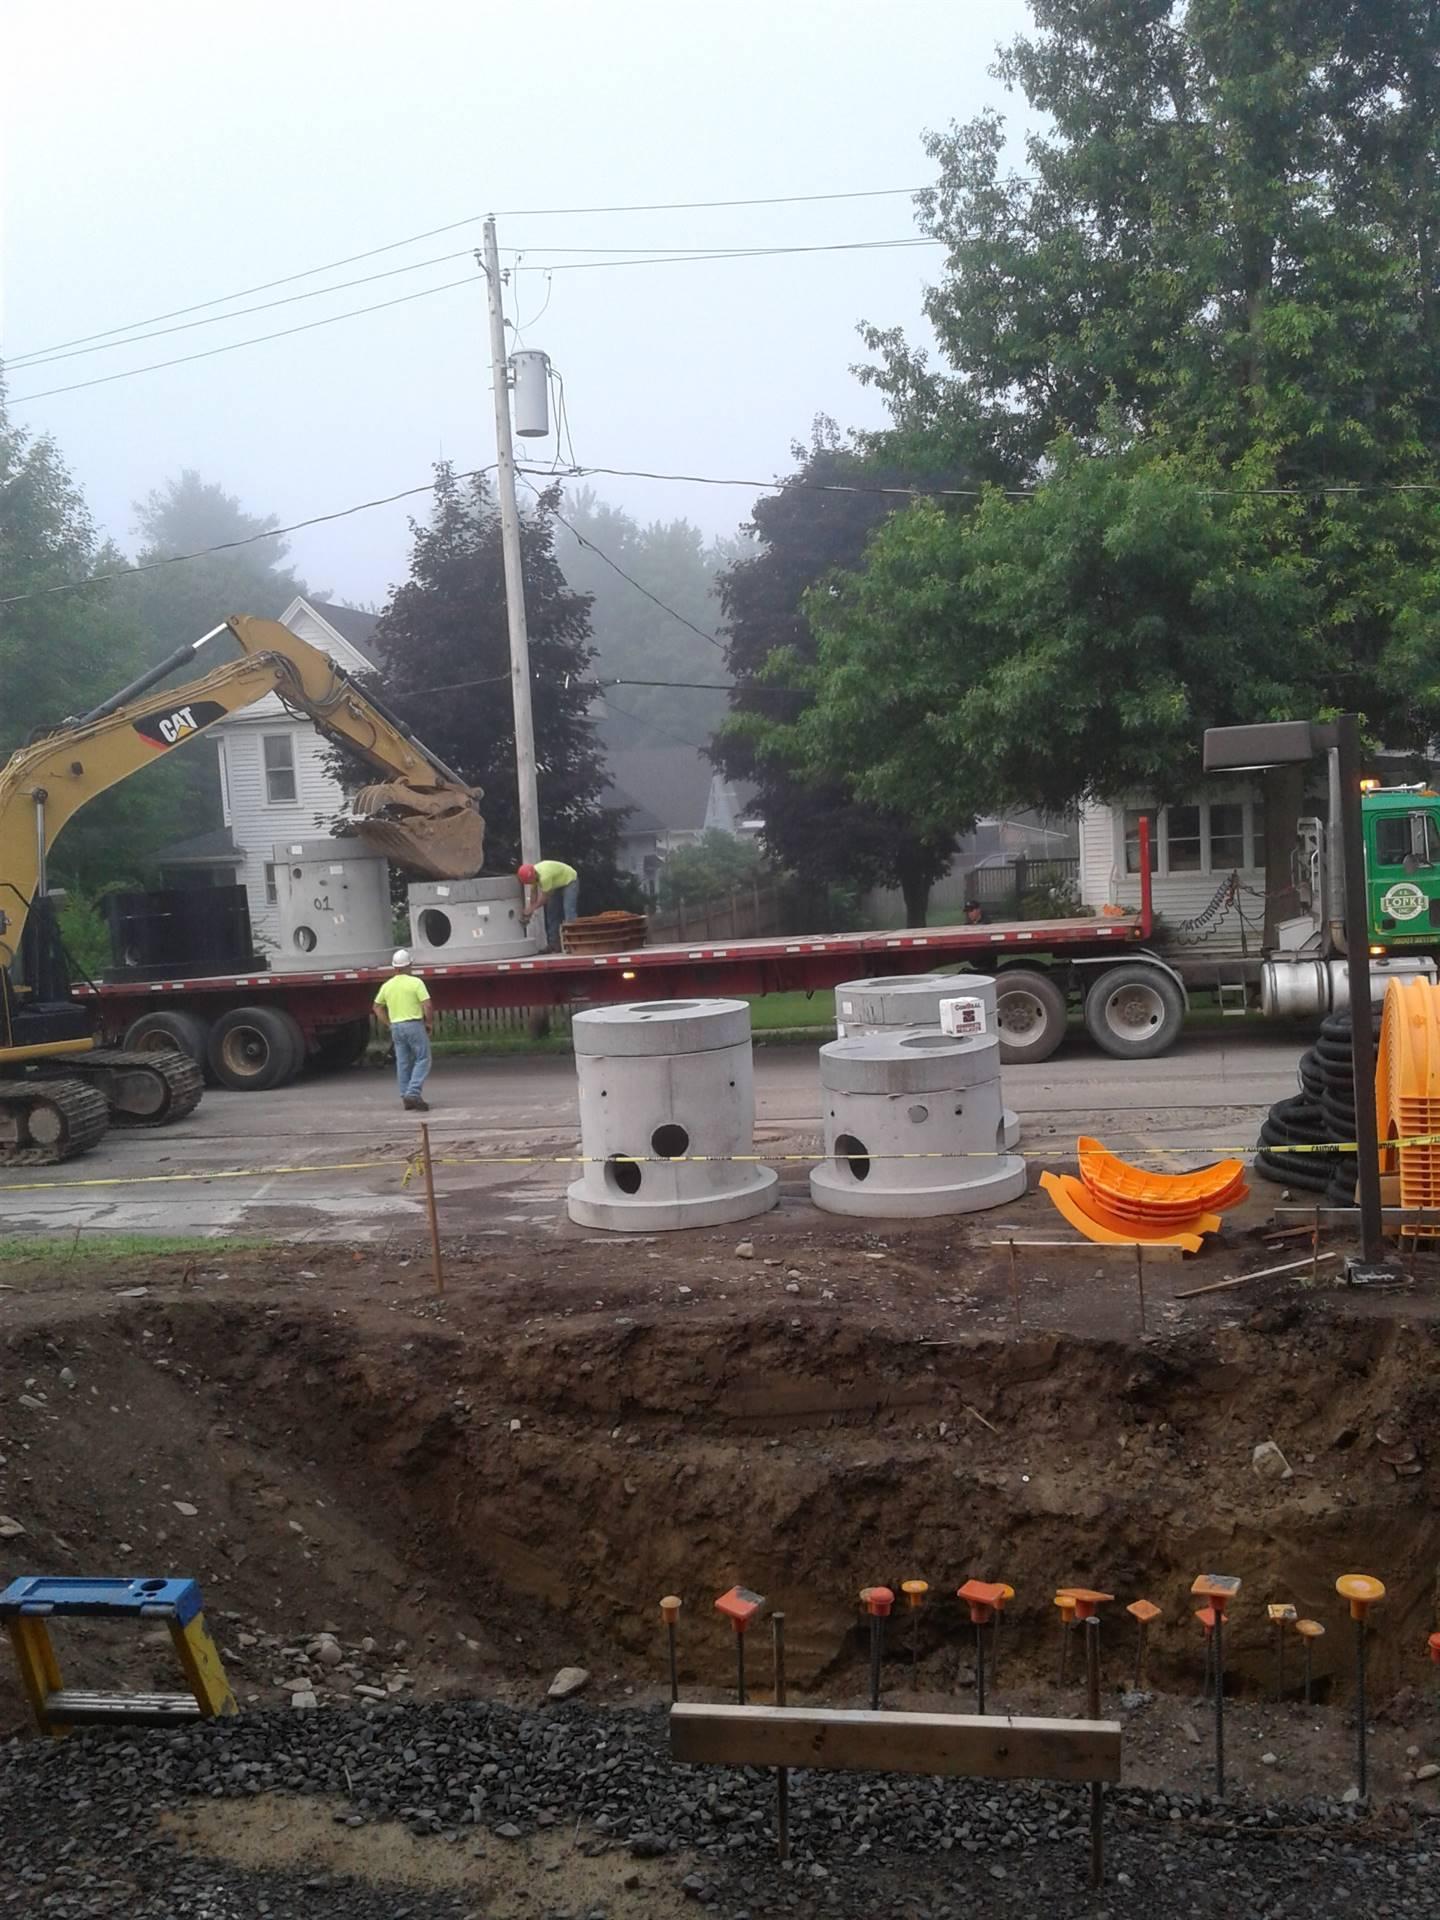 Excavator unloading the catch basins